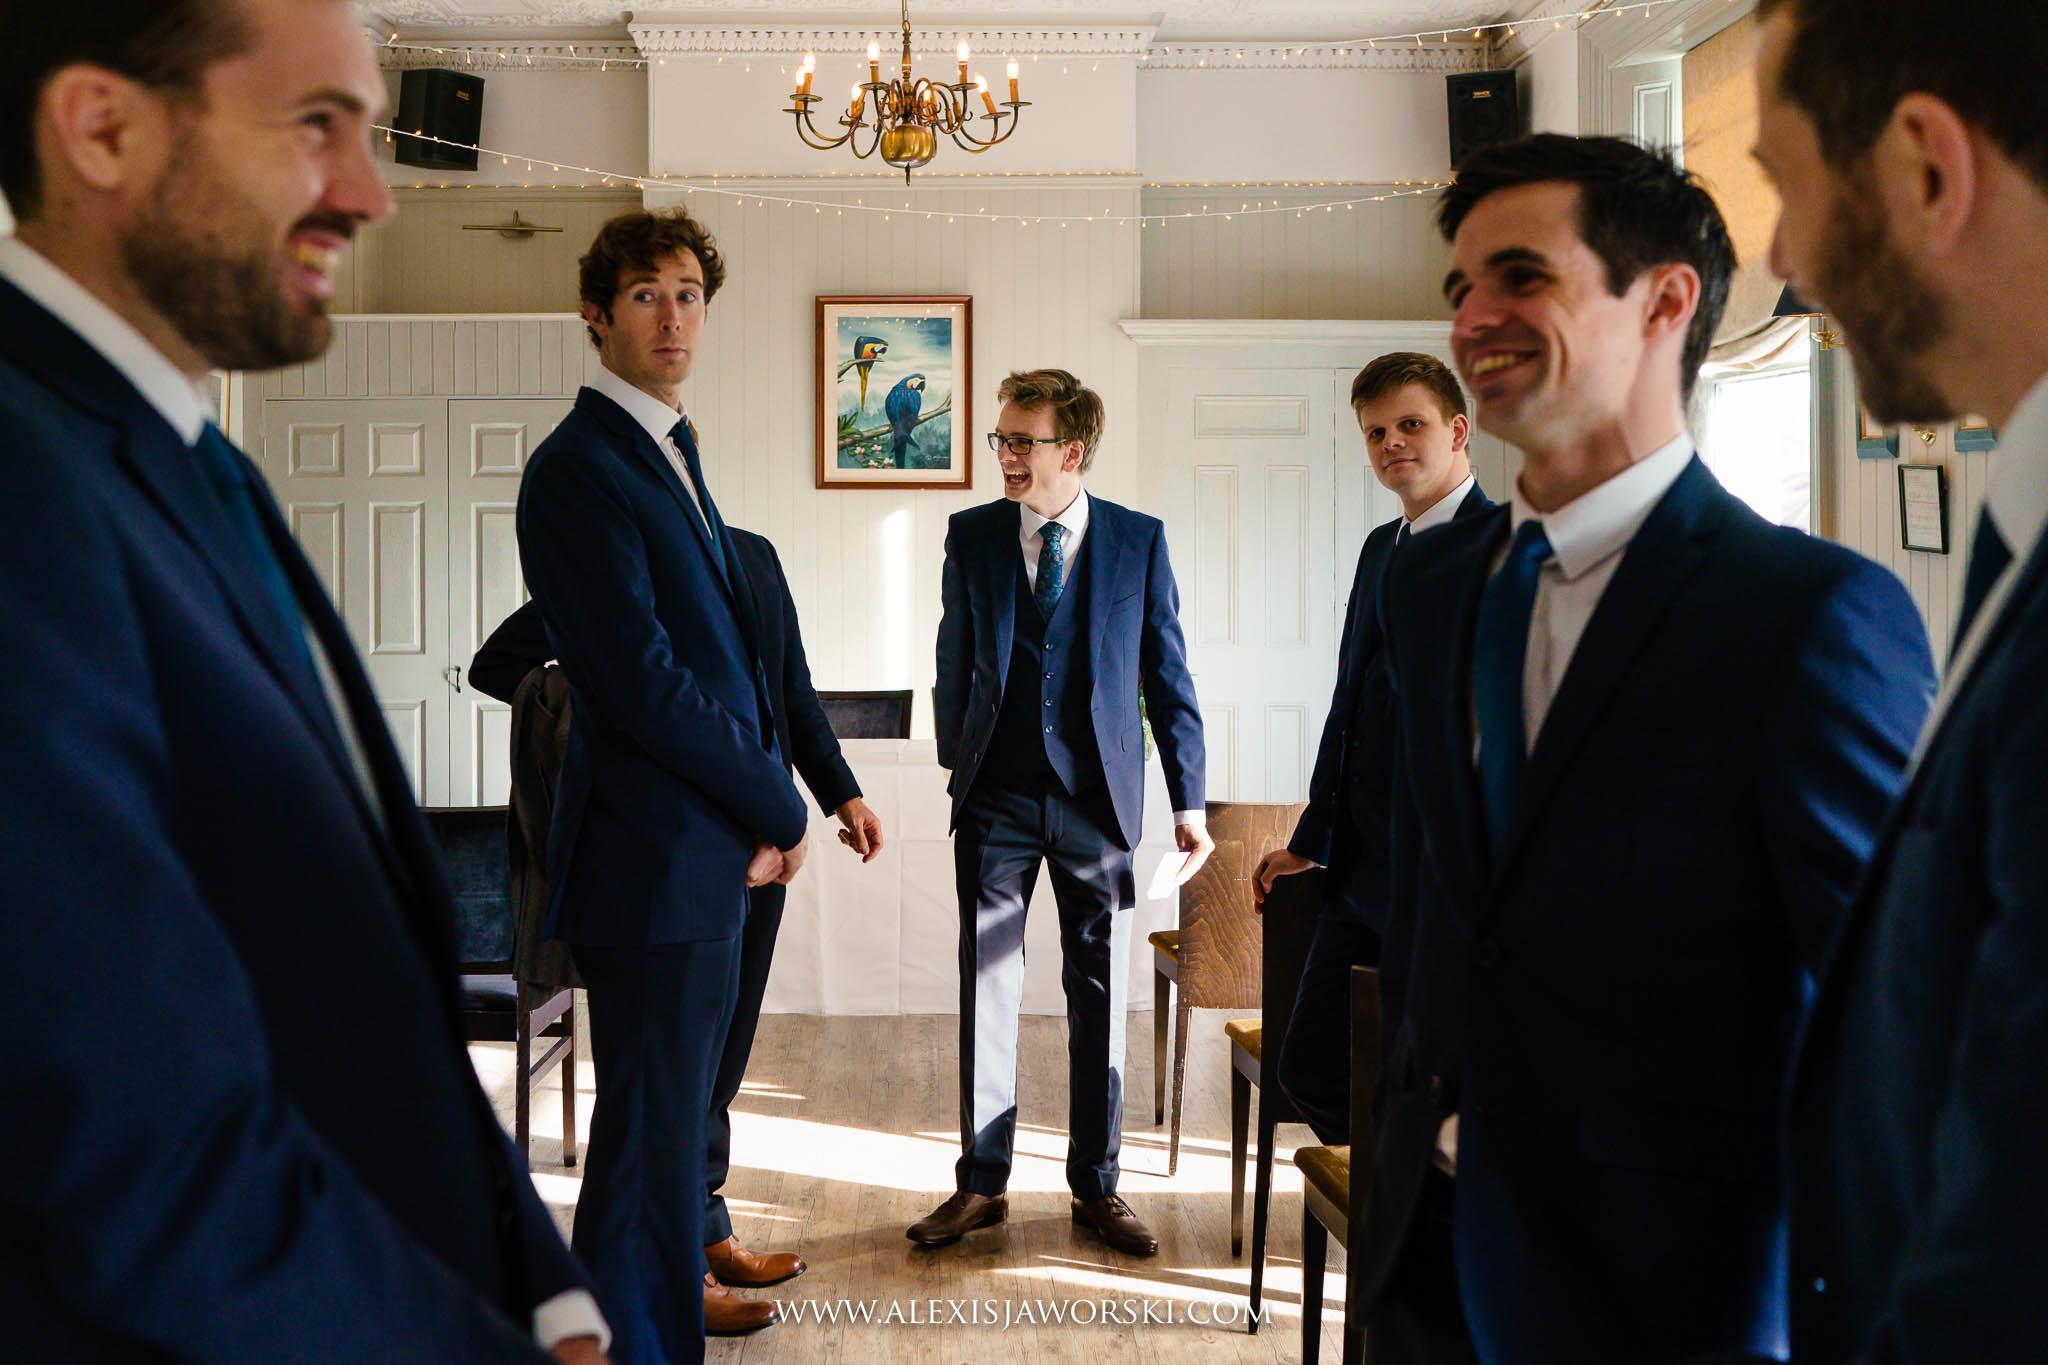 groom briefing the ushers